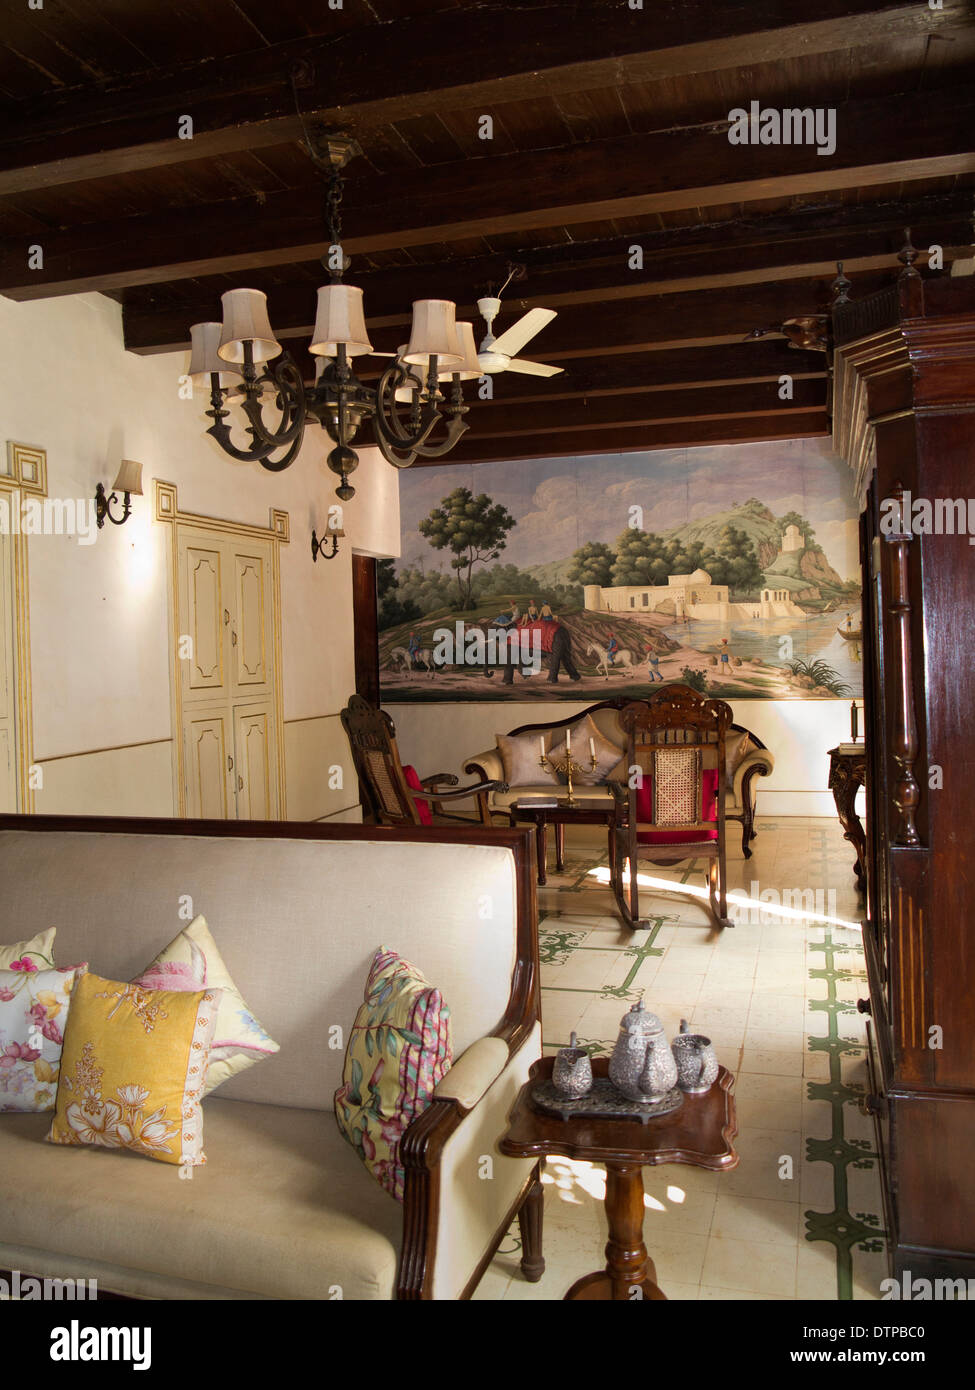 India, Goa, Siolim House, Portuguese colonial era mansion accommodation, sitting room interior - Stock Image